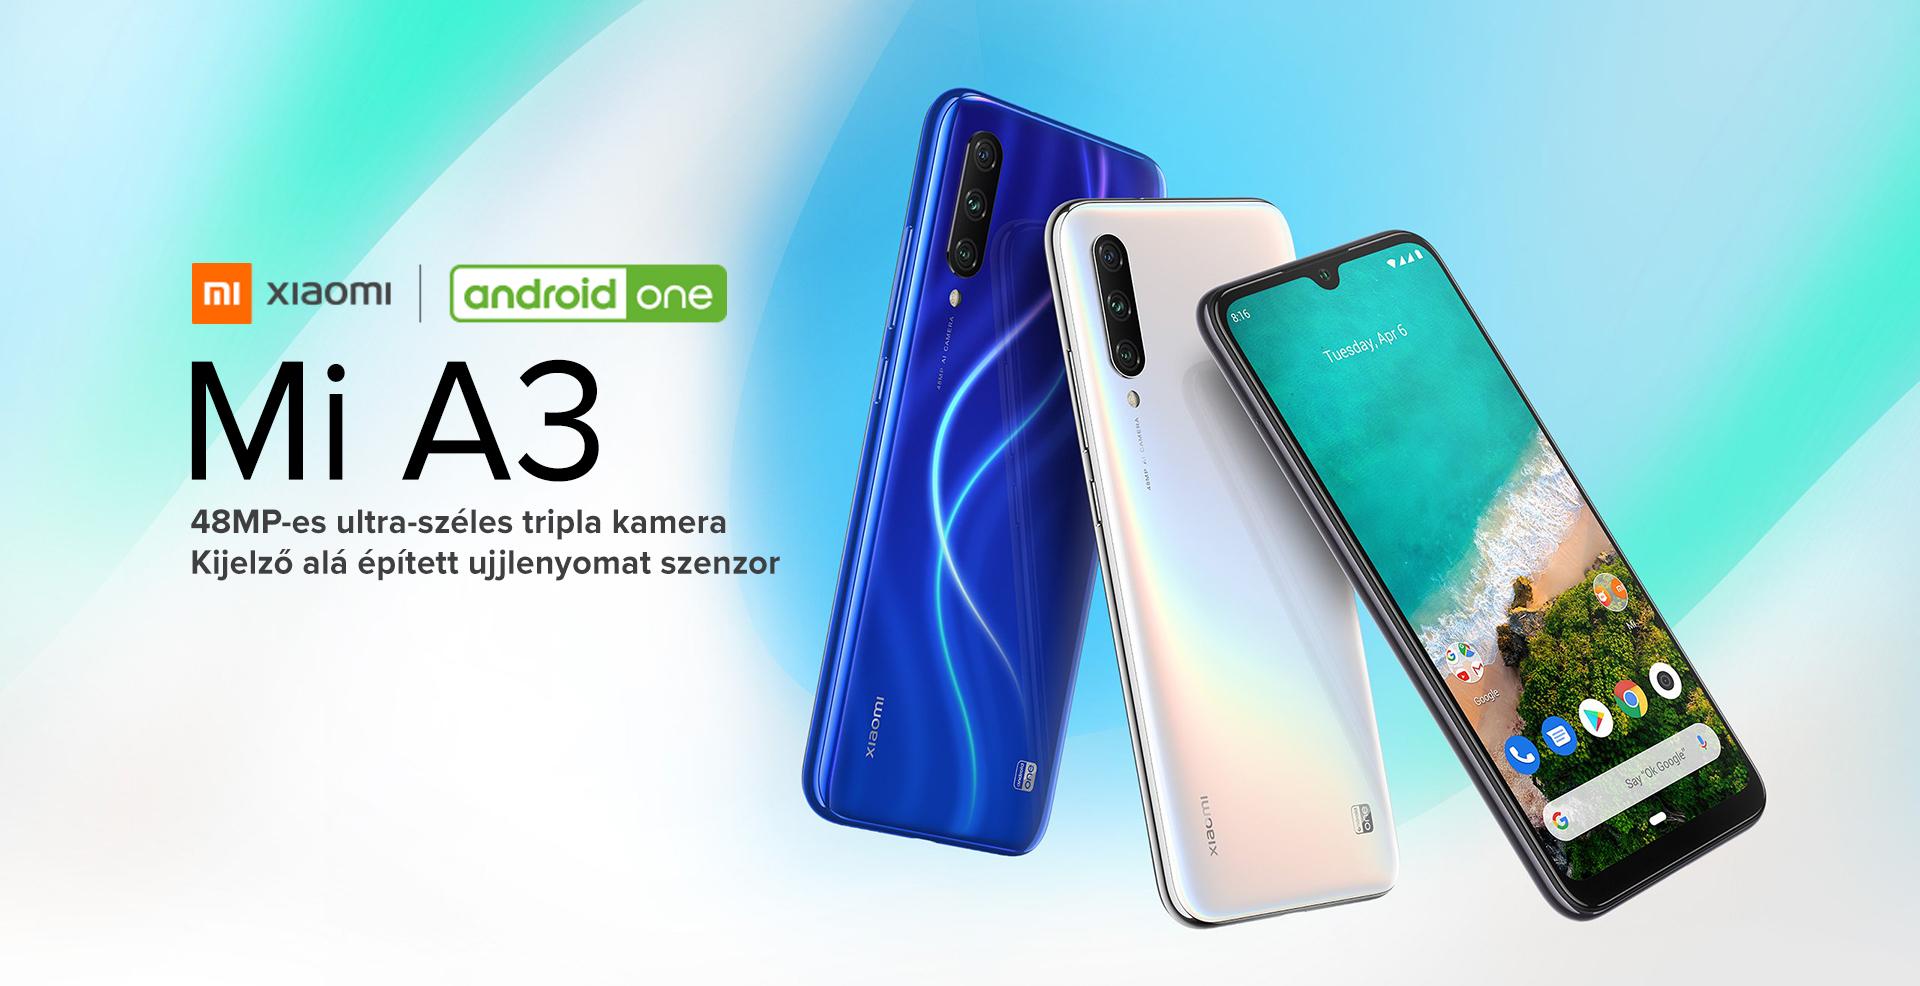 Xiaomi Mi A3 4GB/64GB (Dual SIM) kártyafüggetlen okostelefon, kék (Android) 01